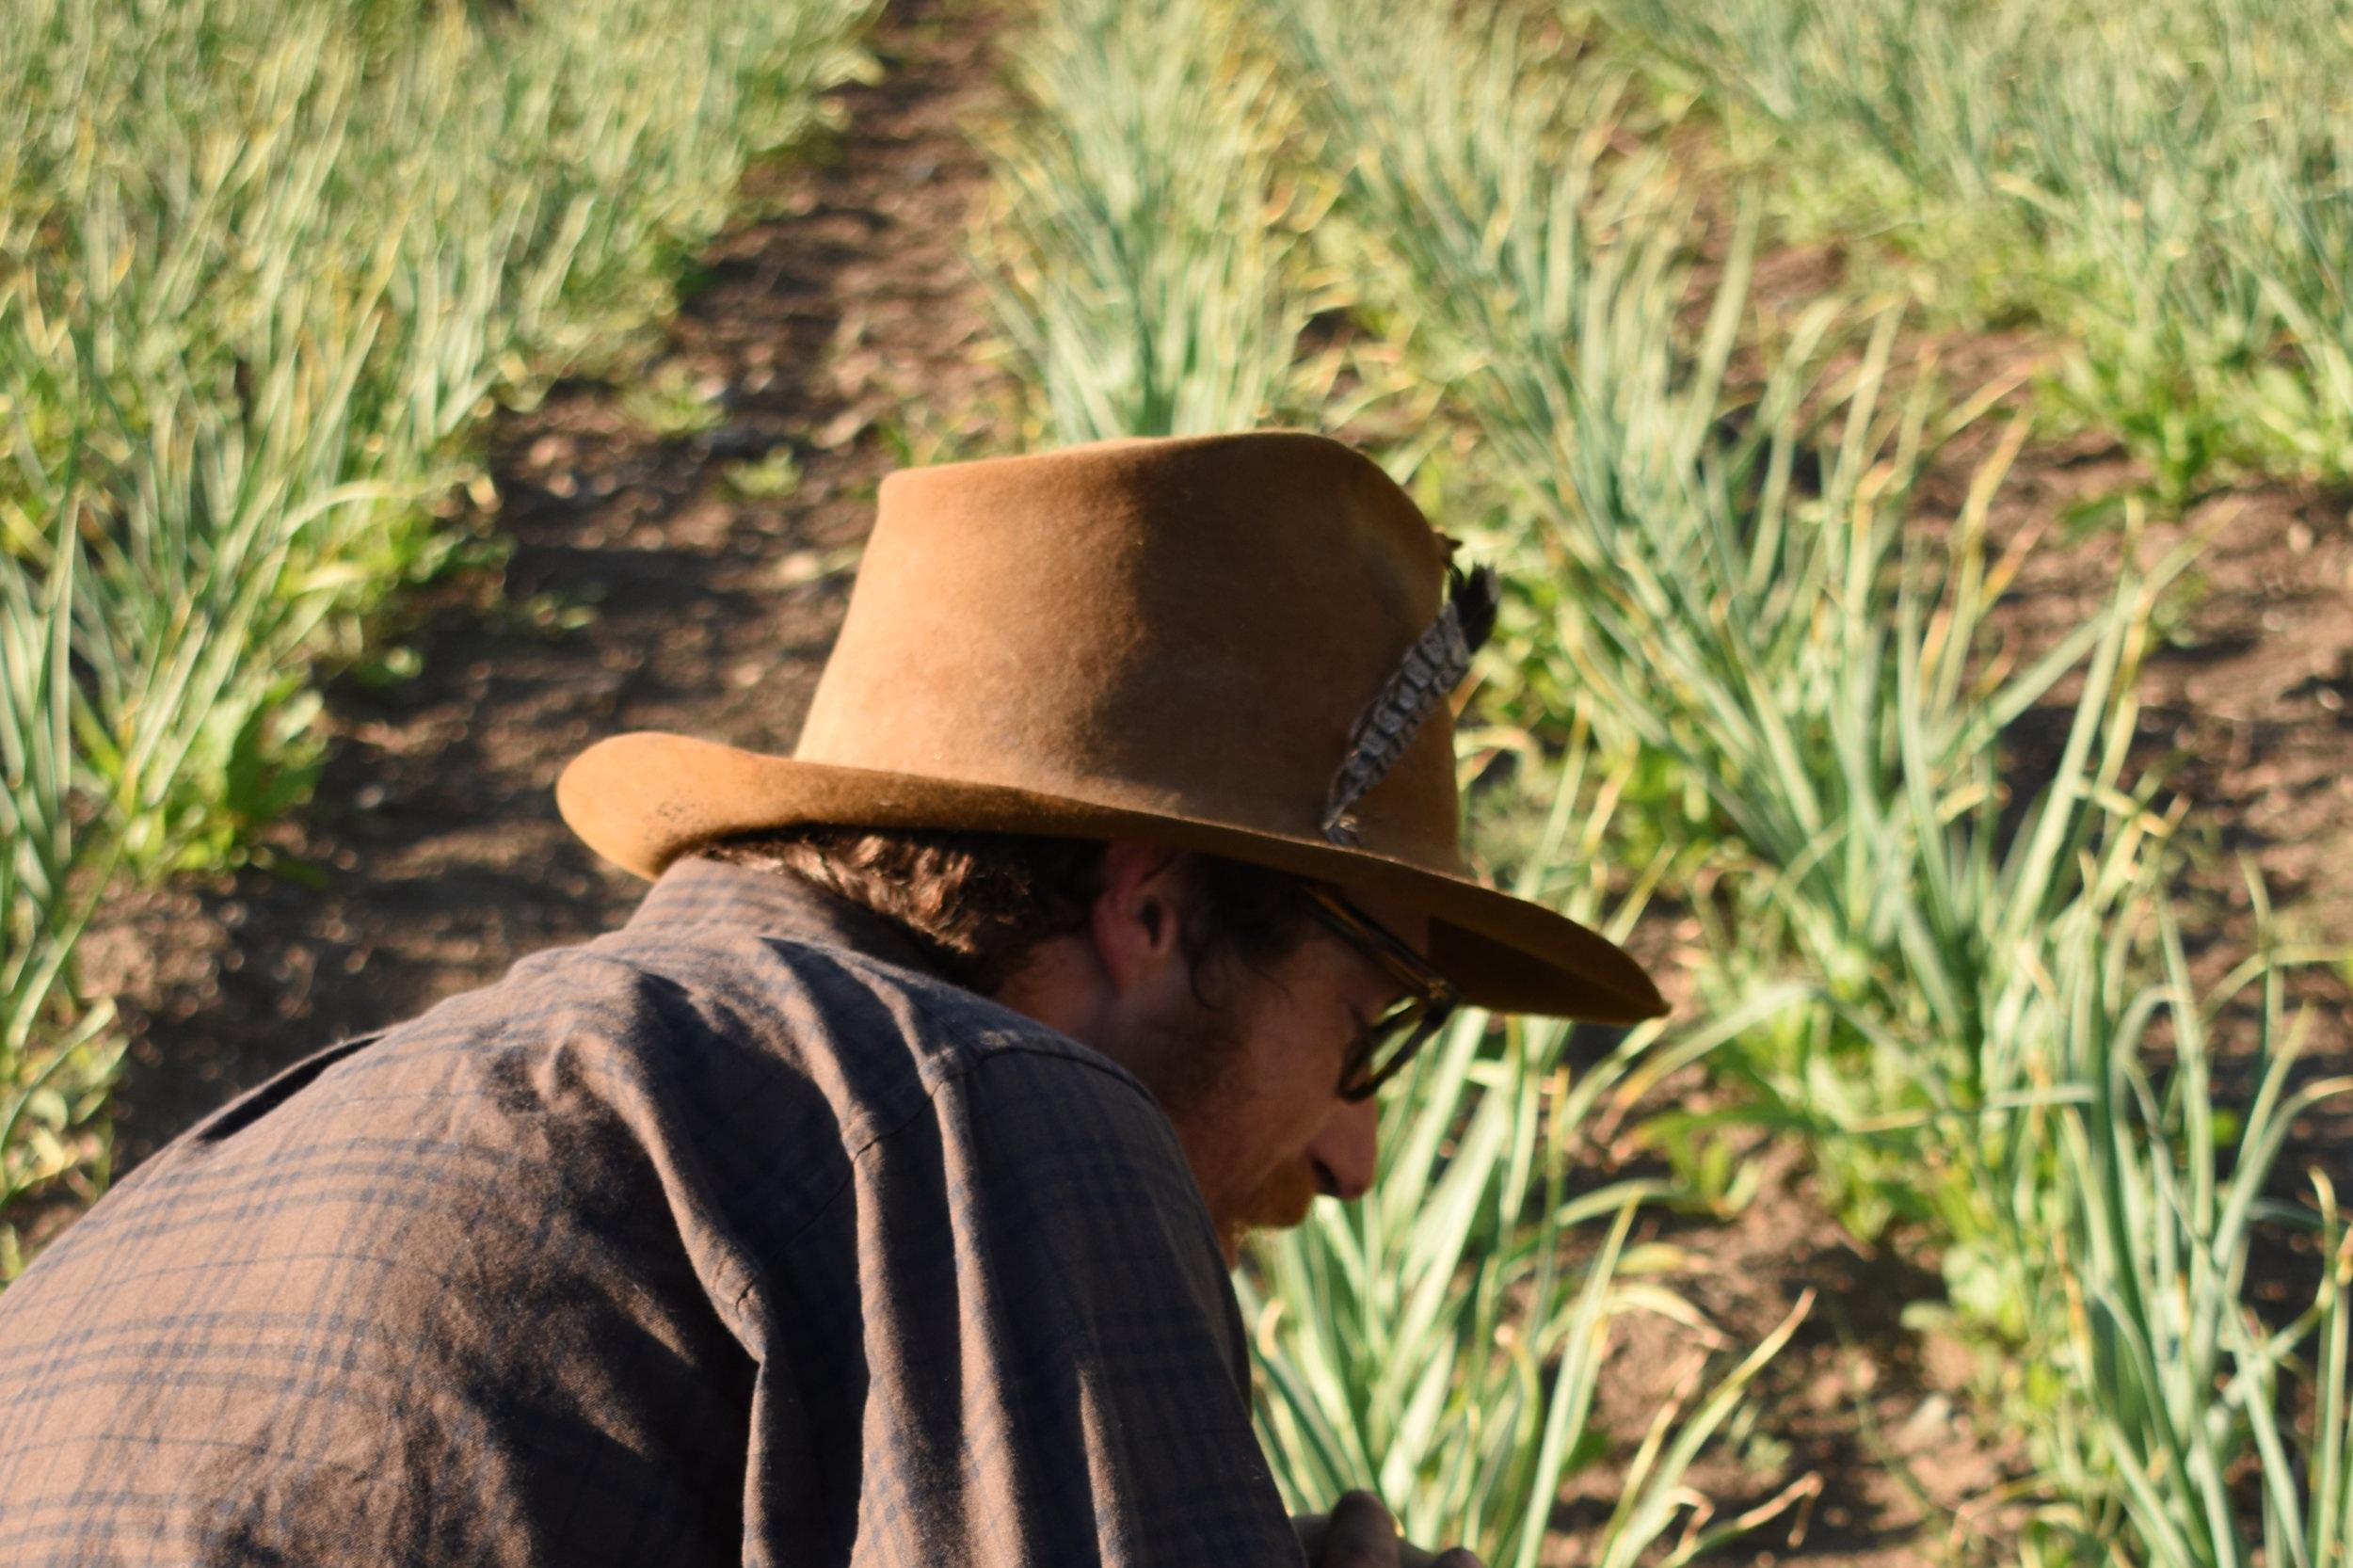 Spring_2018_MethowConservancyAgriculture_AlyssaJumars 190.JPG